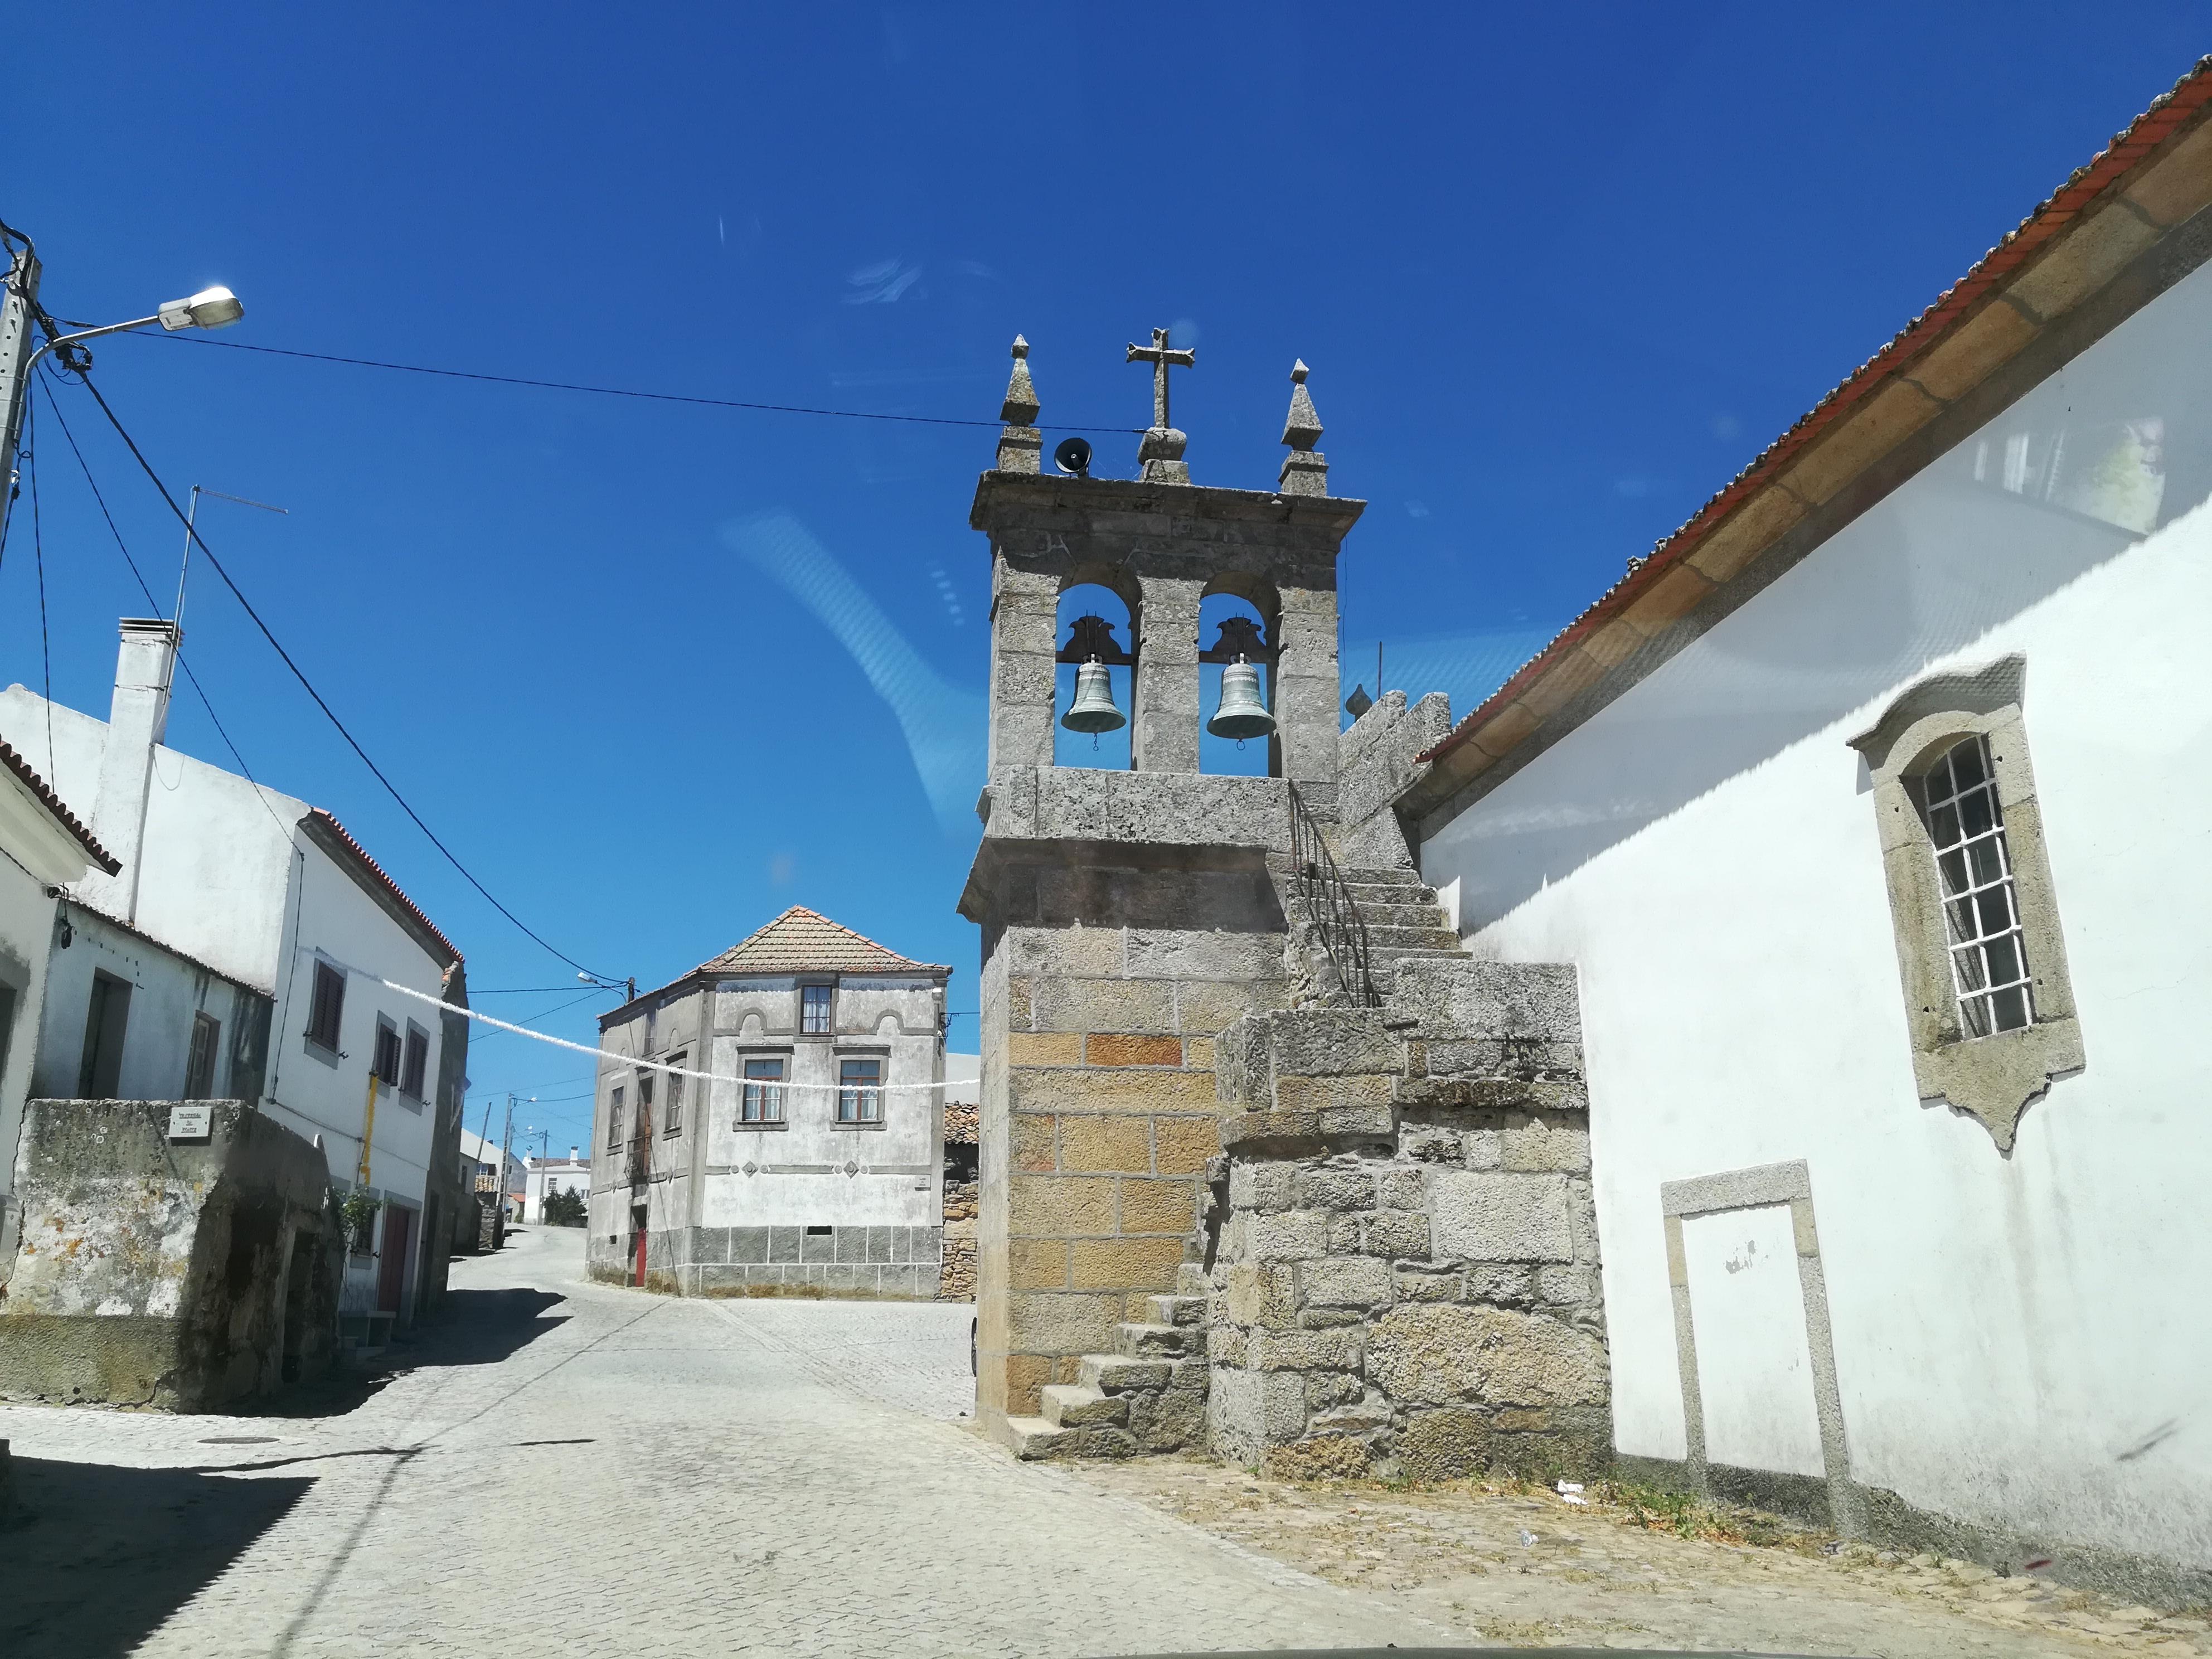 Ade - Almeida